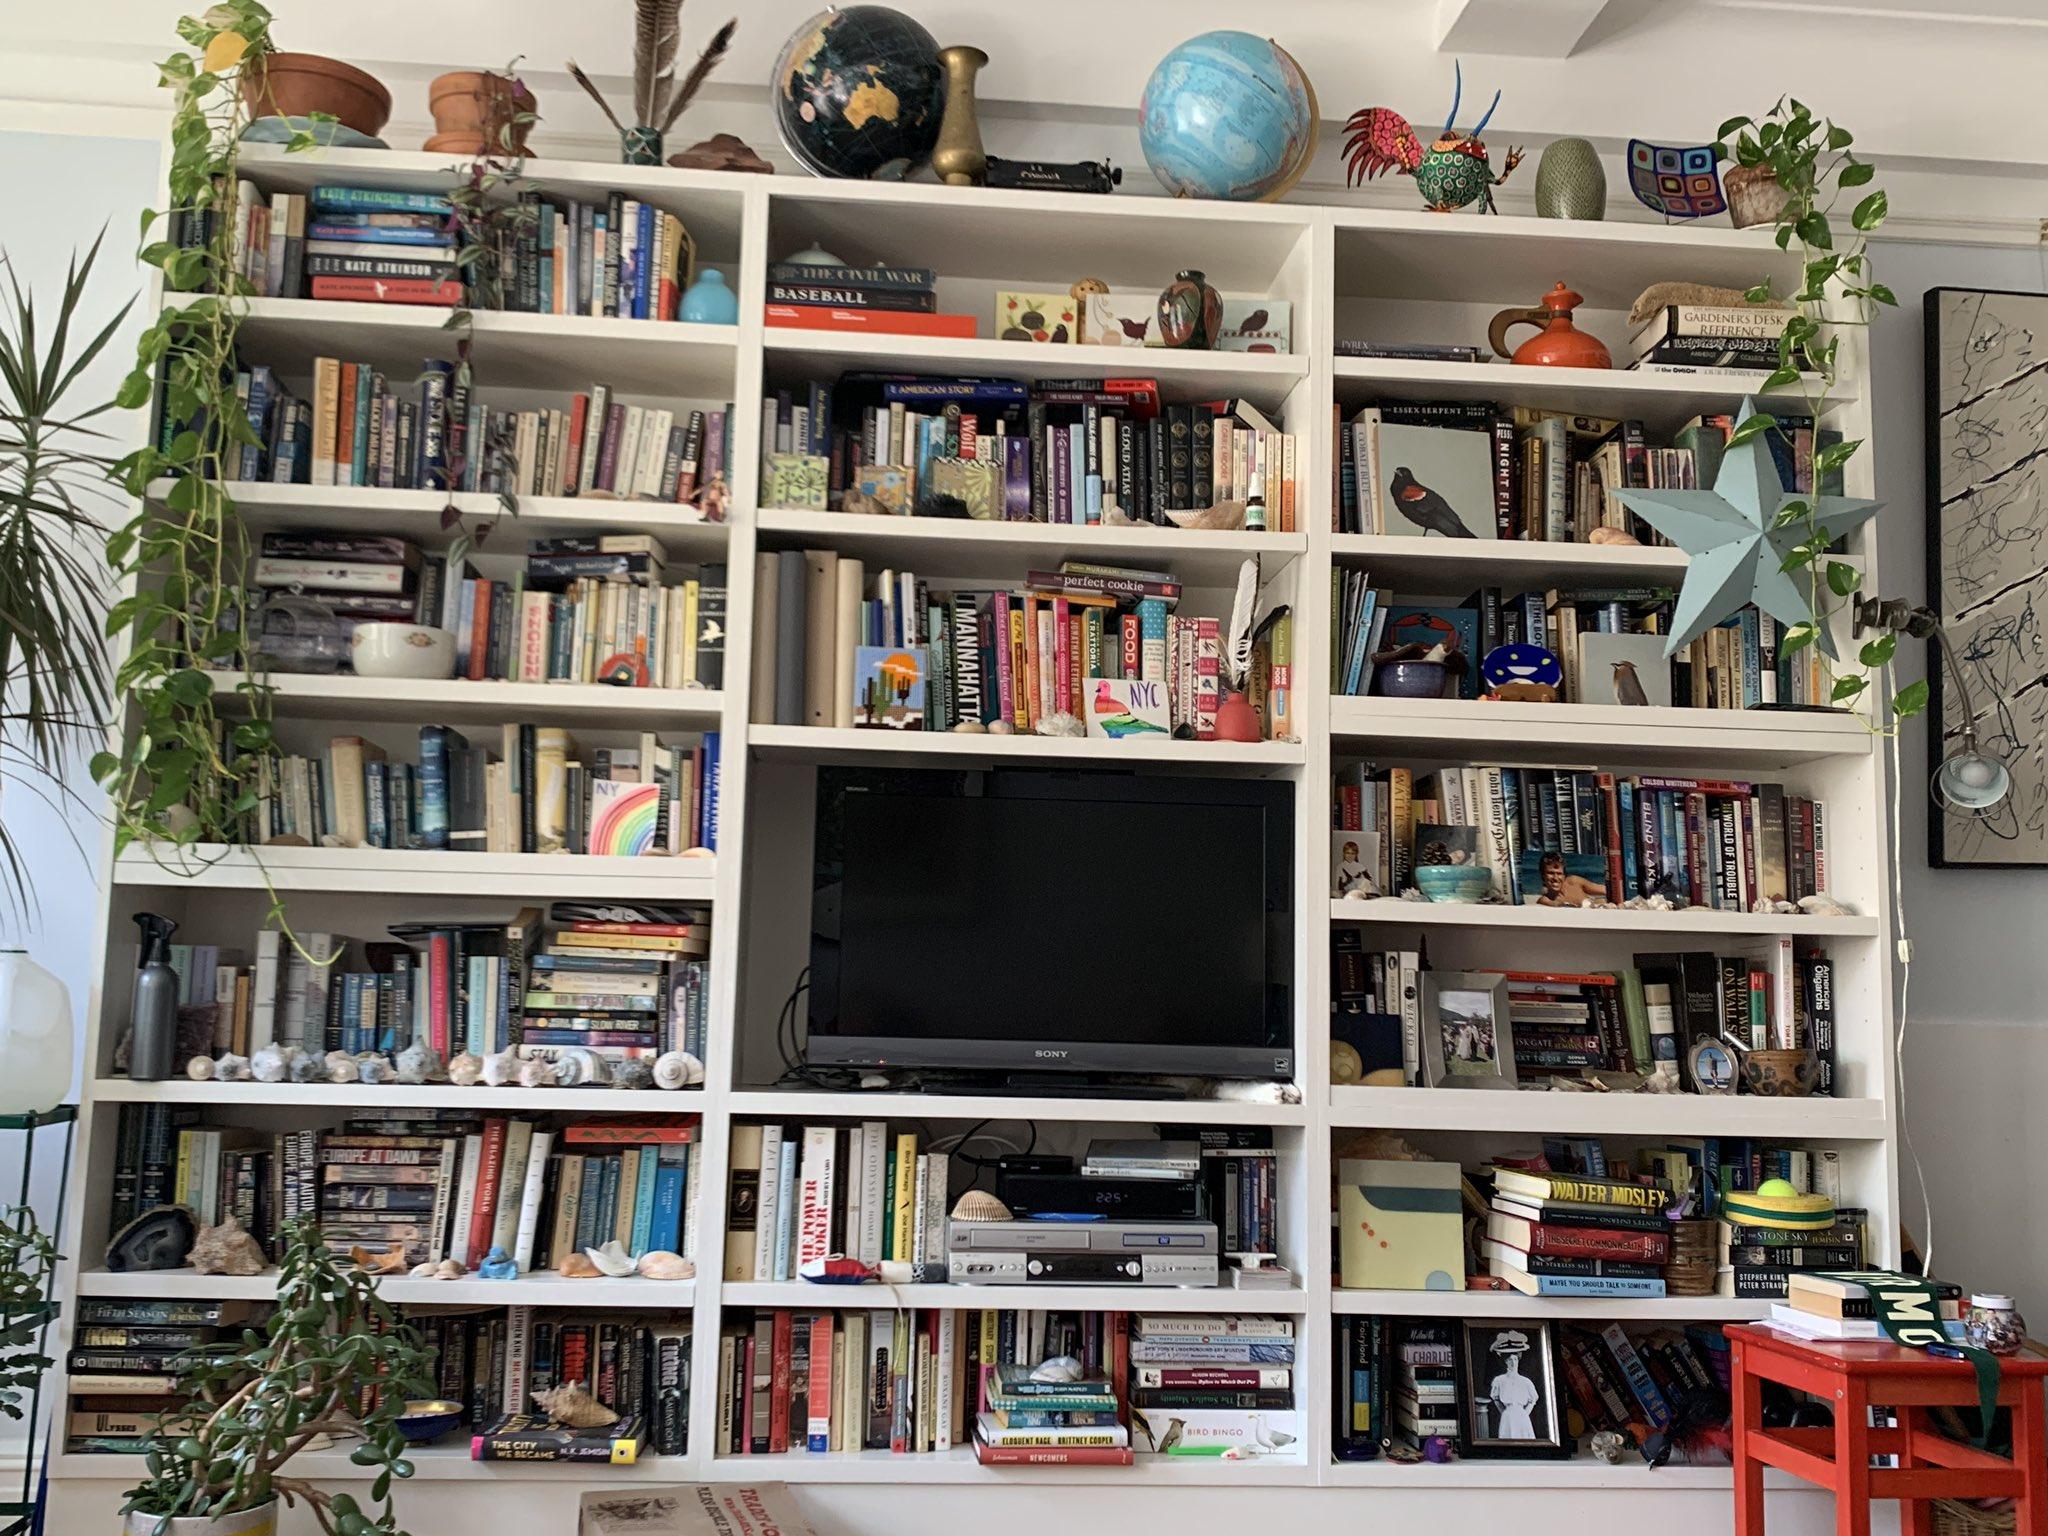 libros estanterias